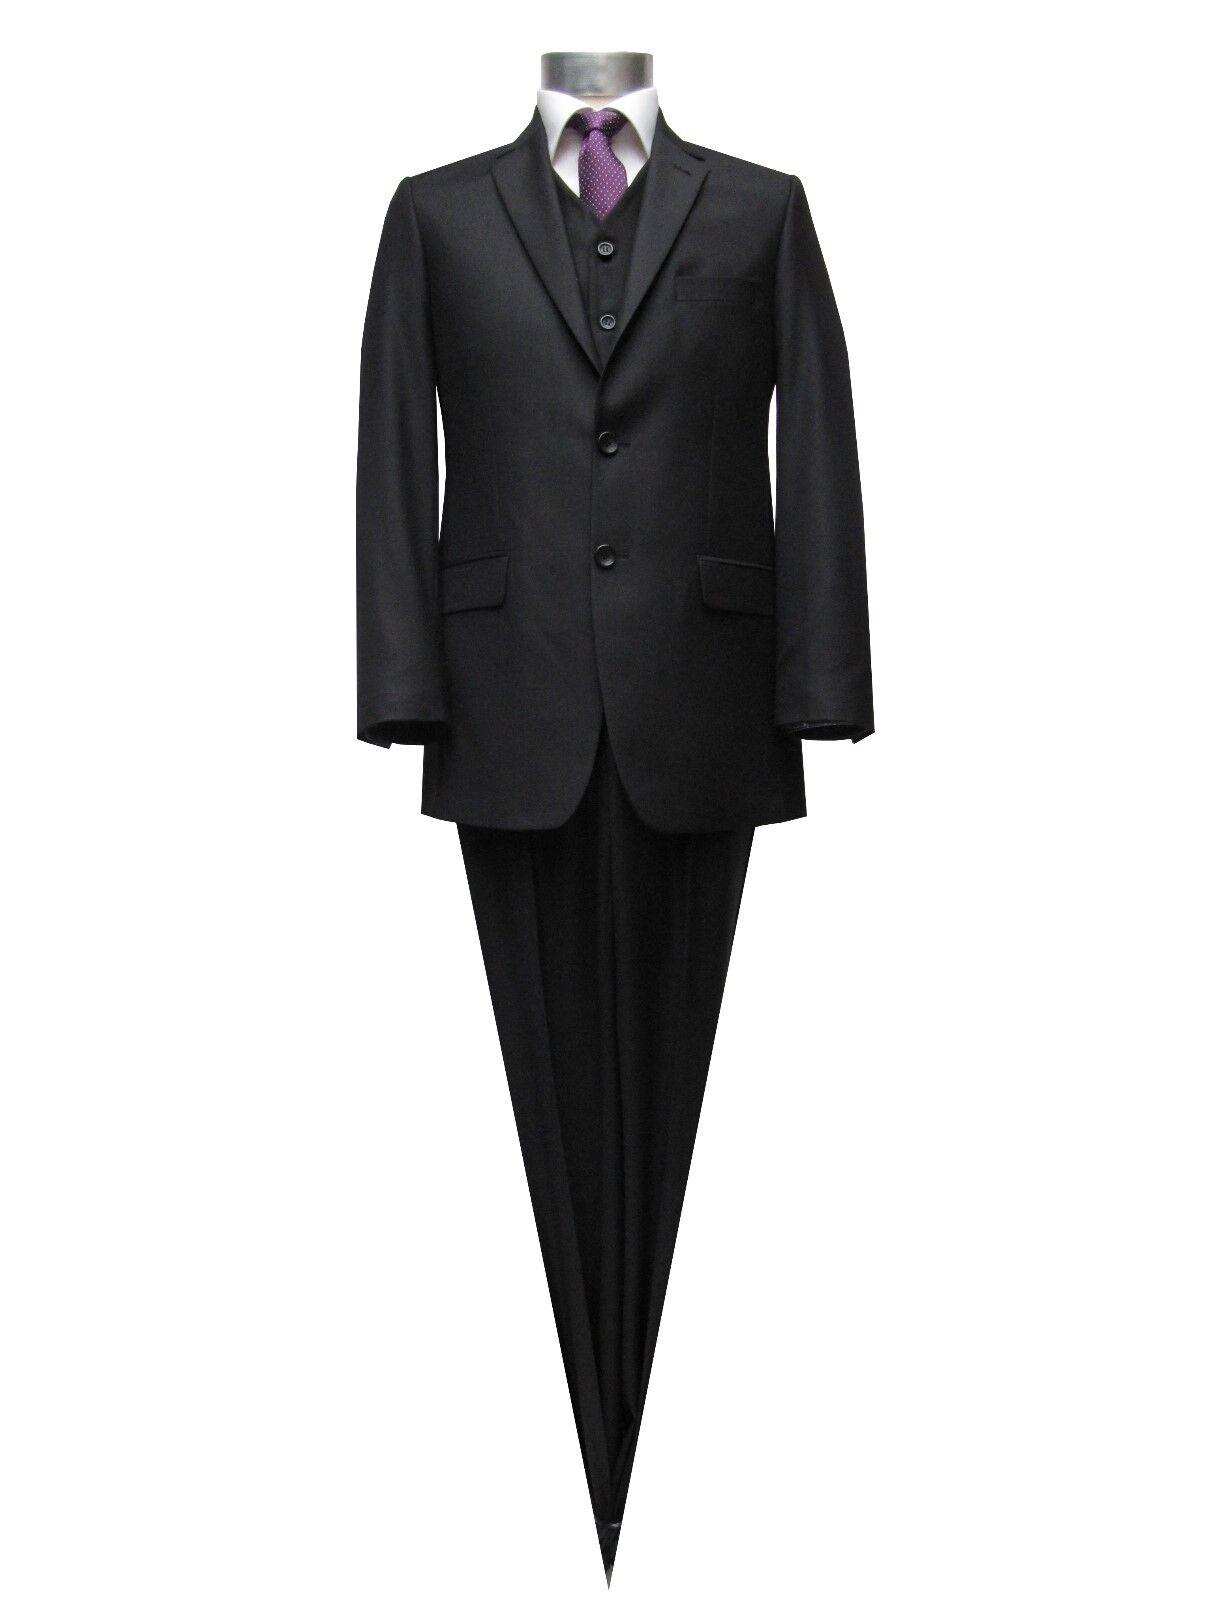 Muga Herren Anzug+Weste Gr.44 Schwarz